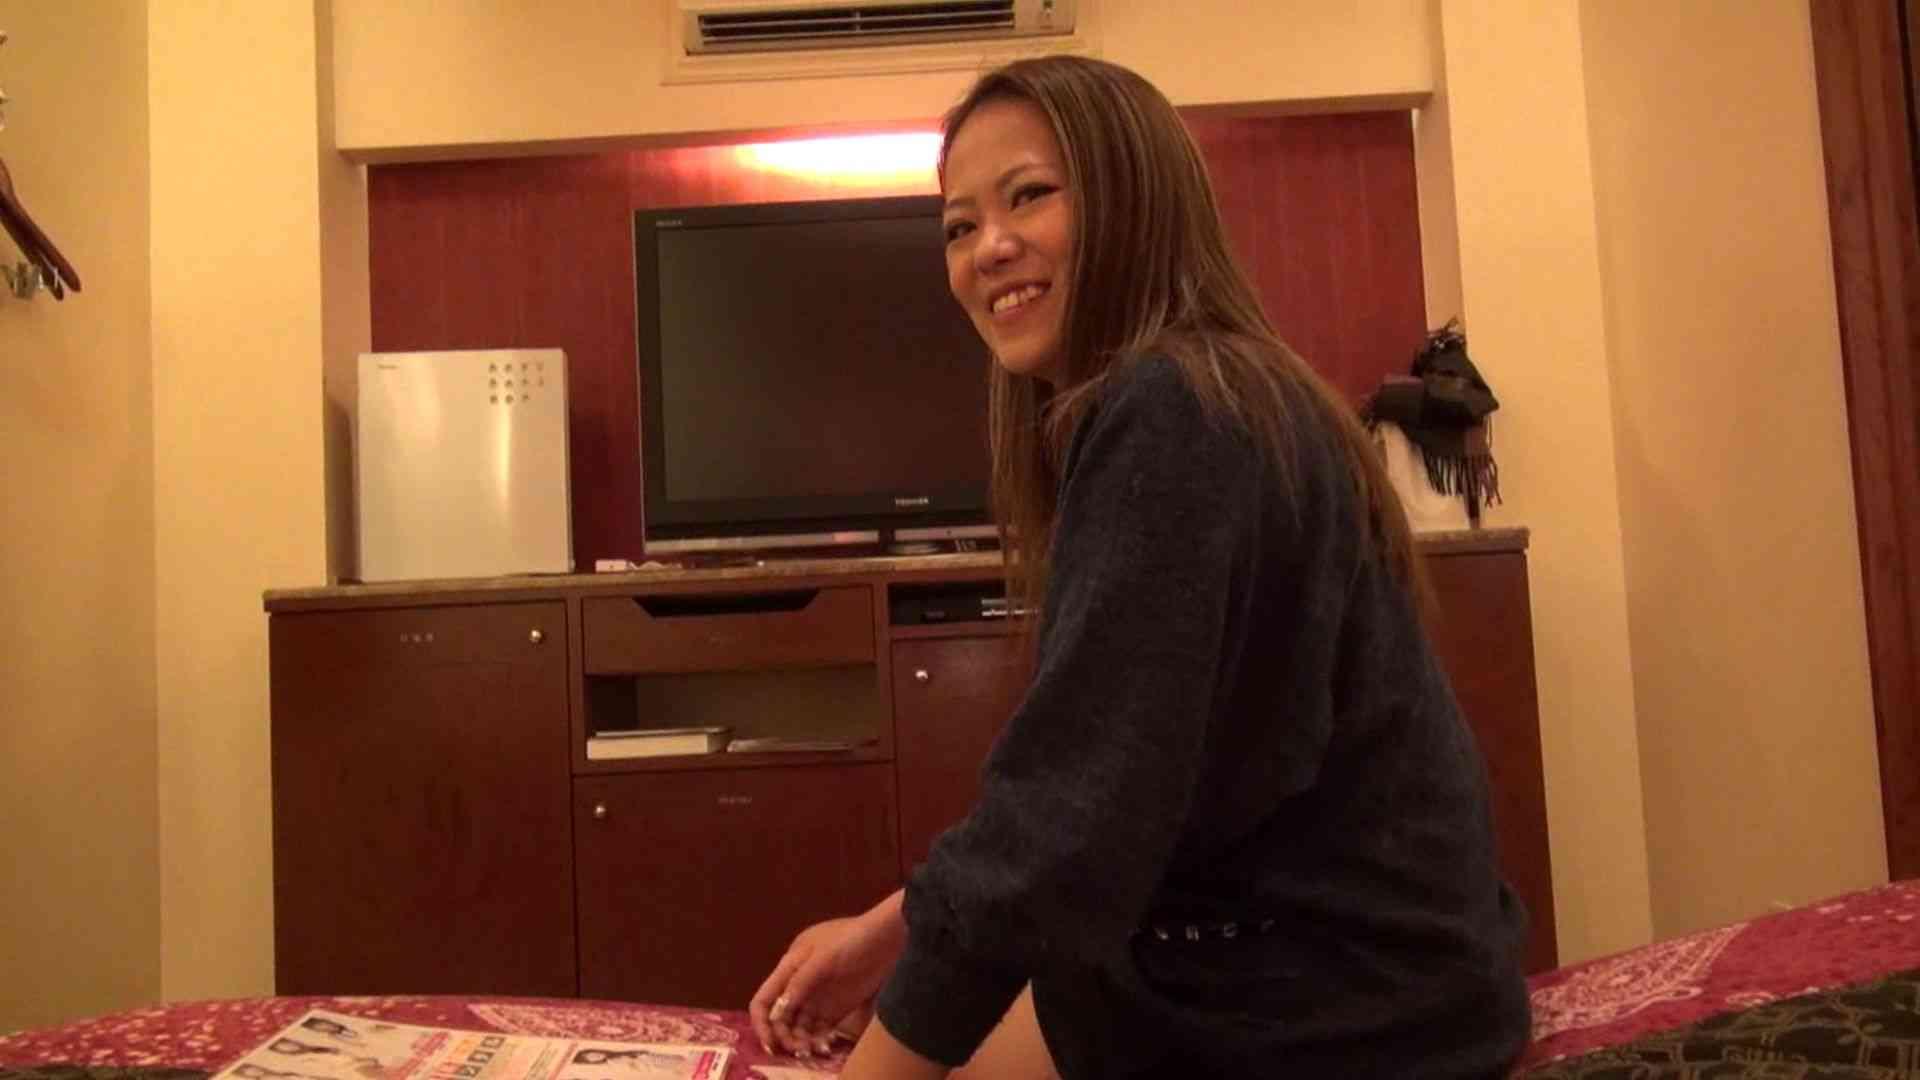 S級厳選美女ビッチガールVol.52 前編 モデル流出動画 | すけべな美女  82画像 29